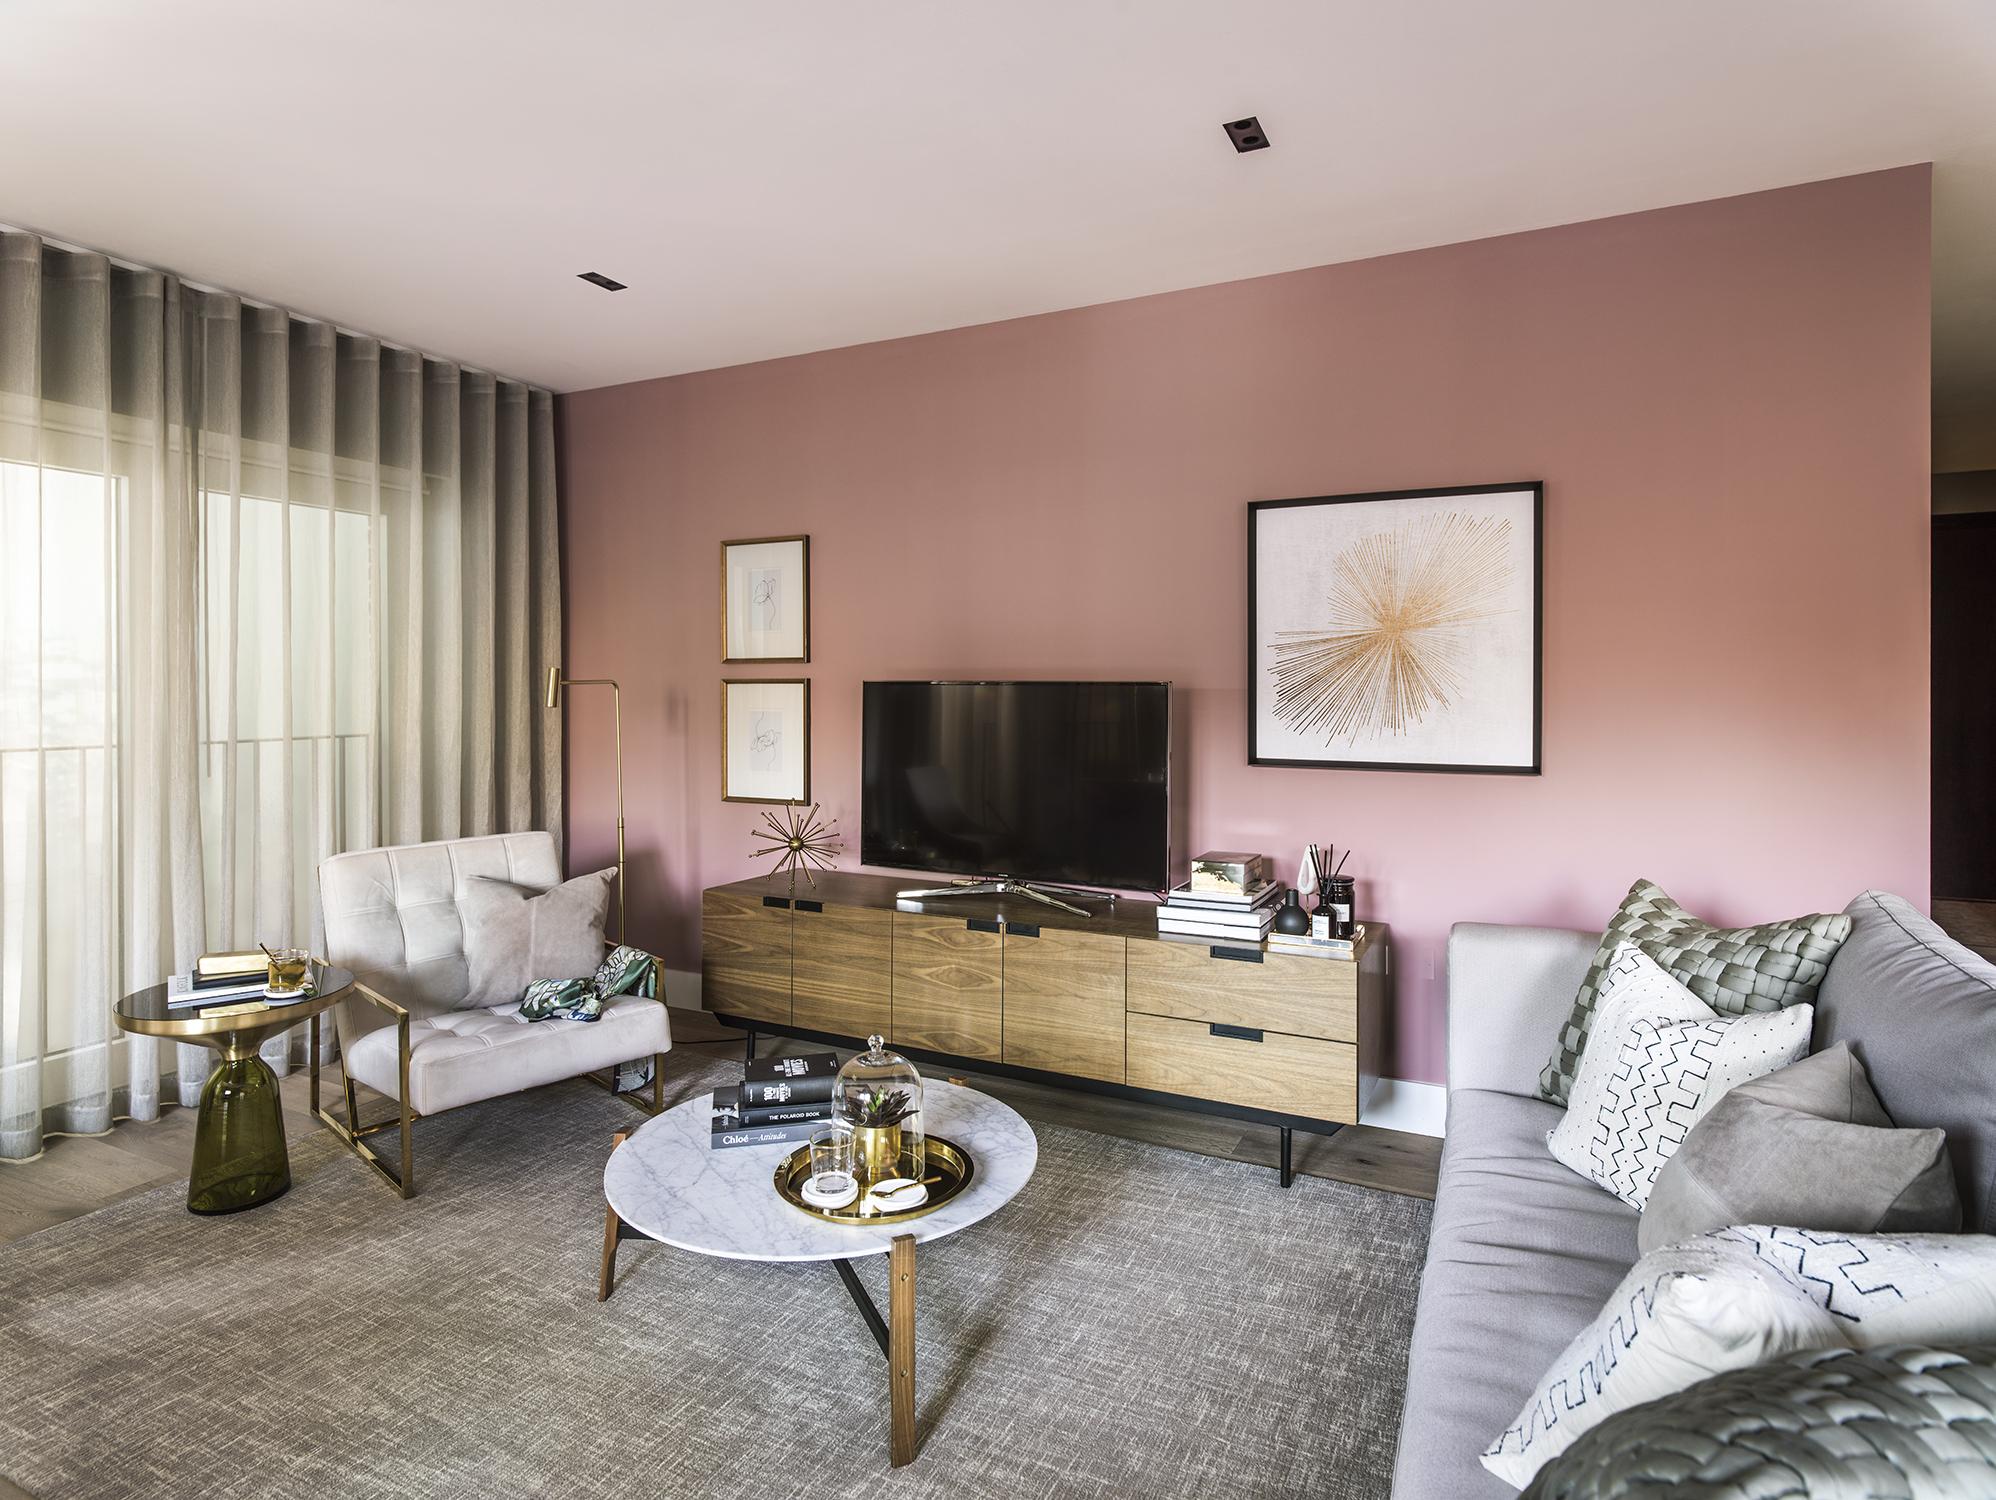 Keybridge,Fabrica,Mount Anvil,Lounge